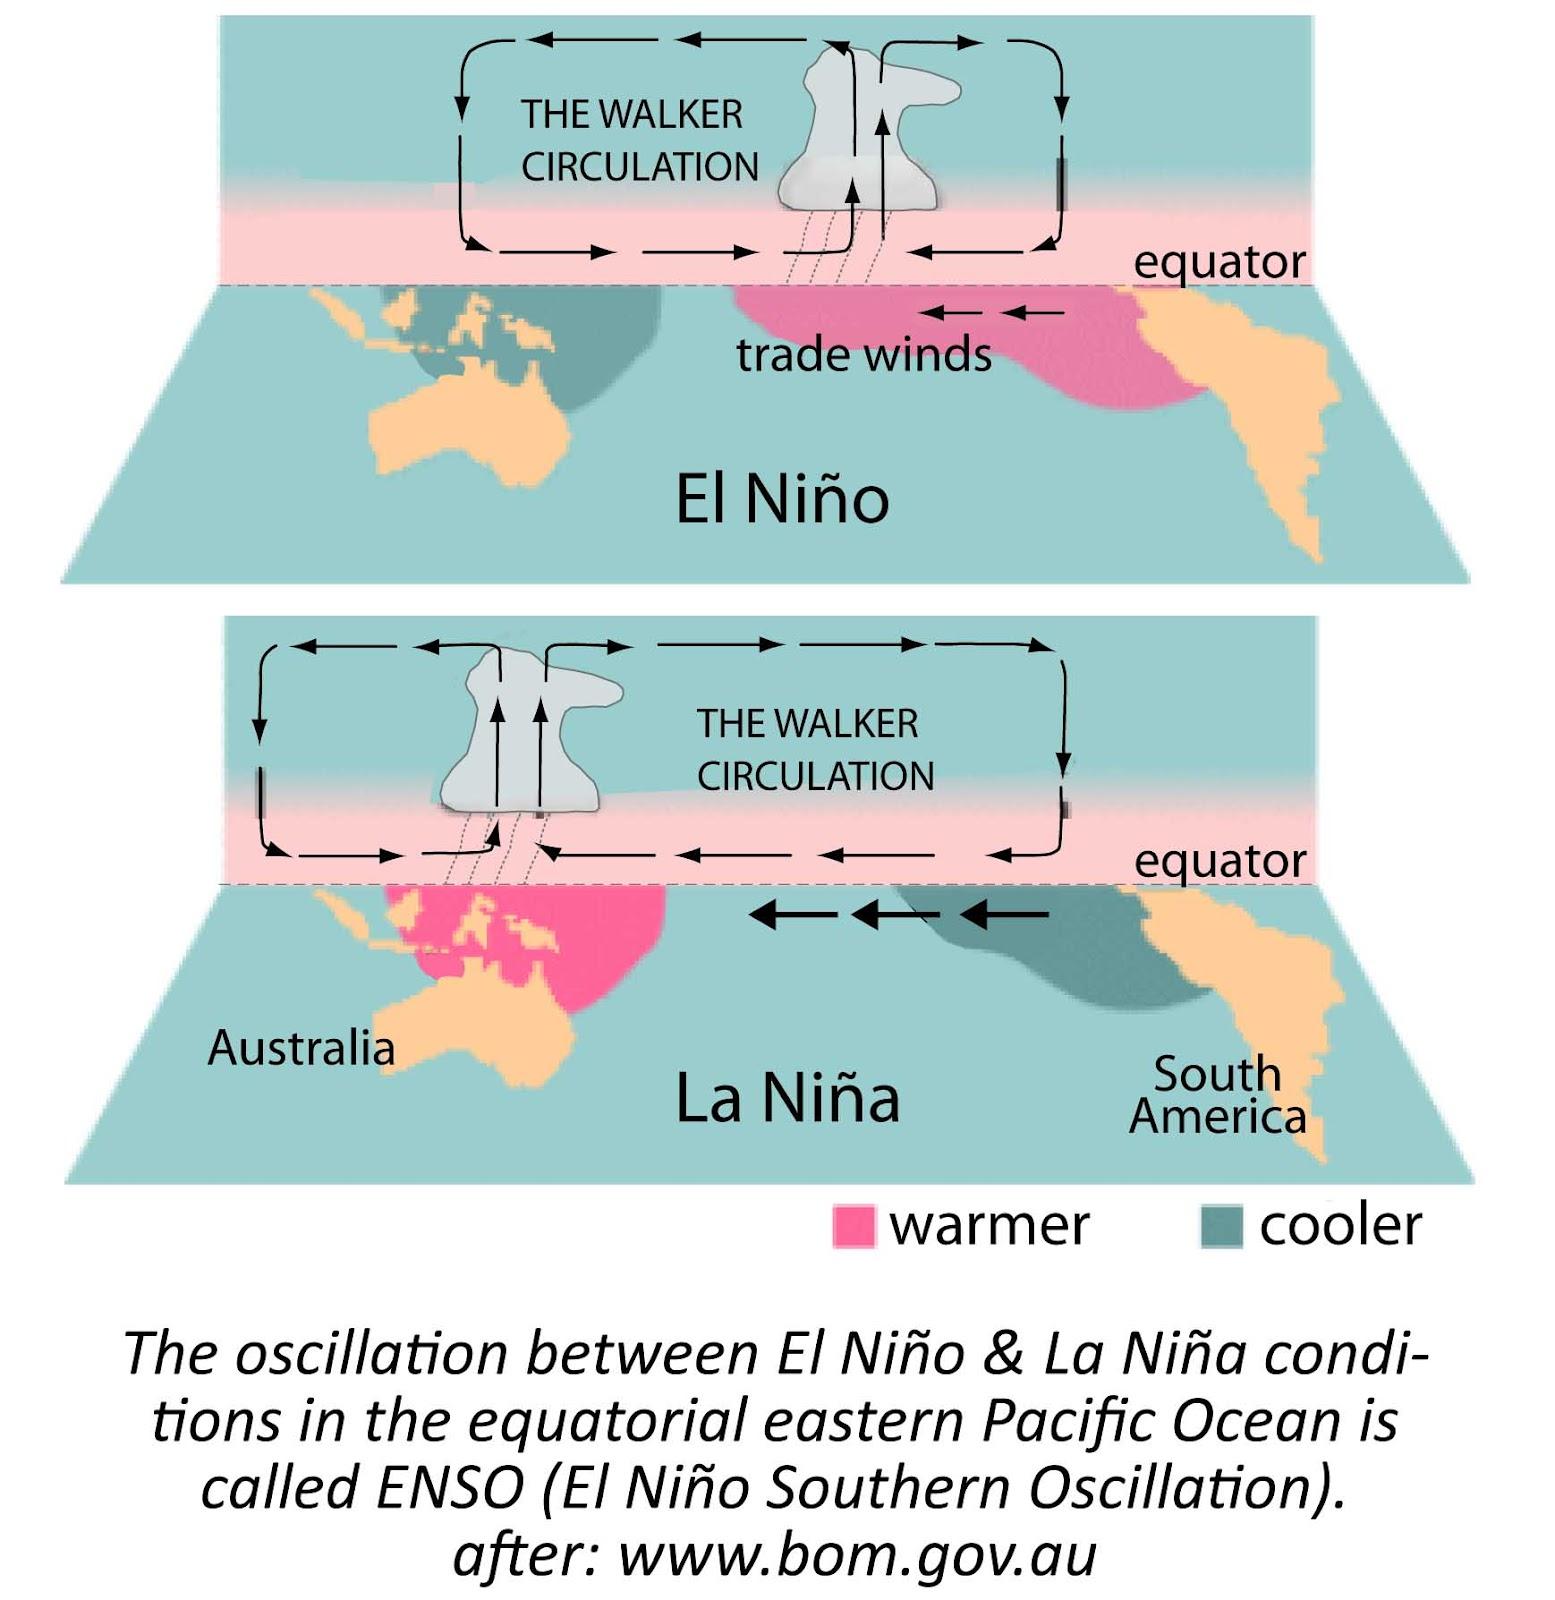 Venn Diagram Of El Nino And La Nina